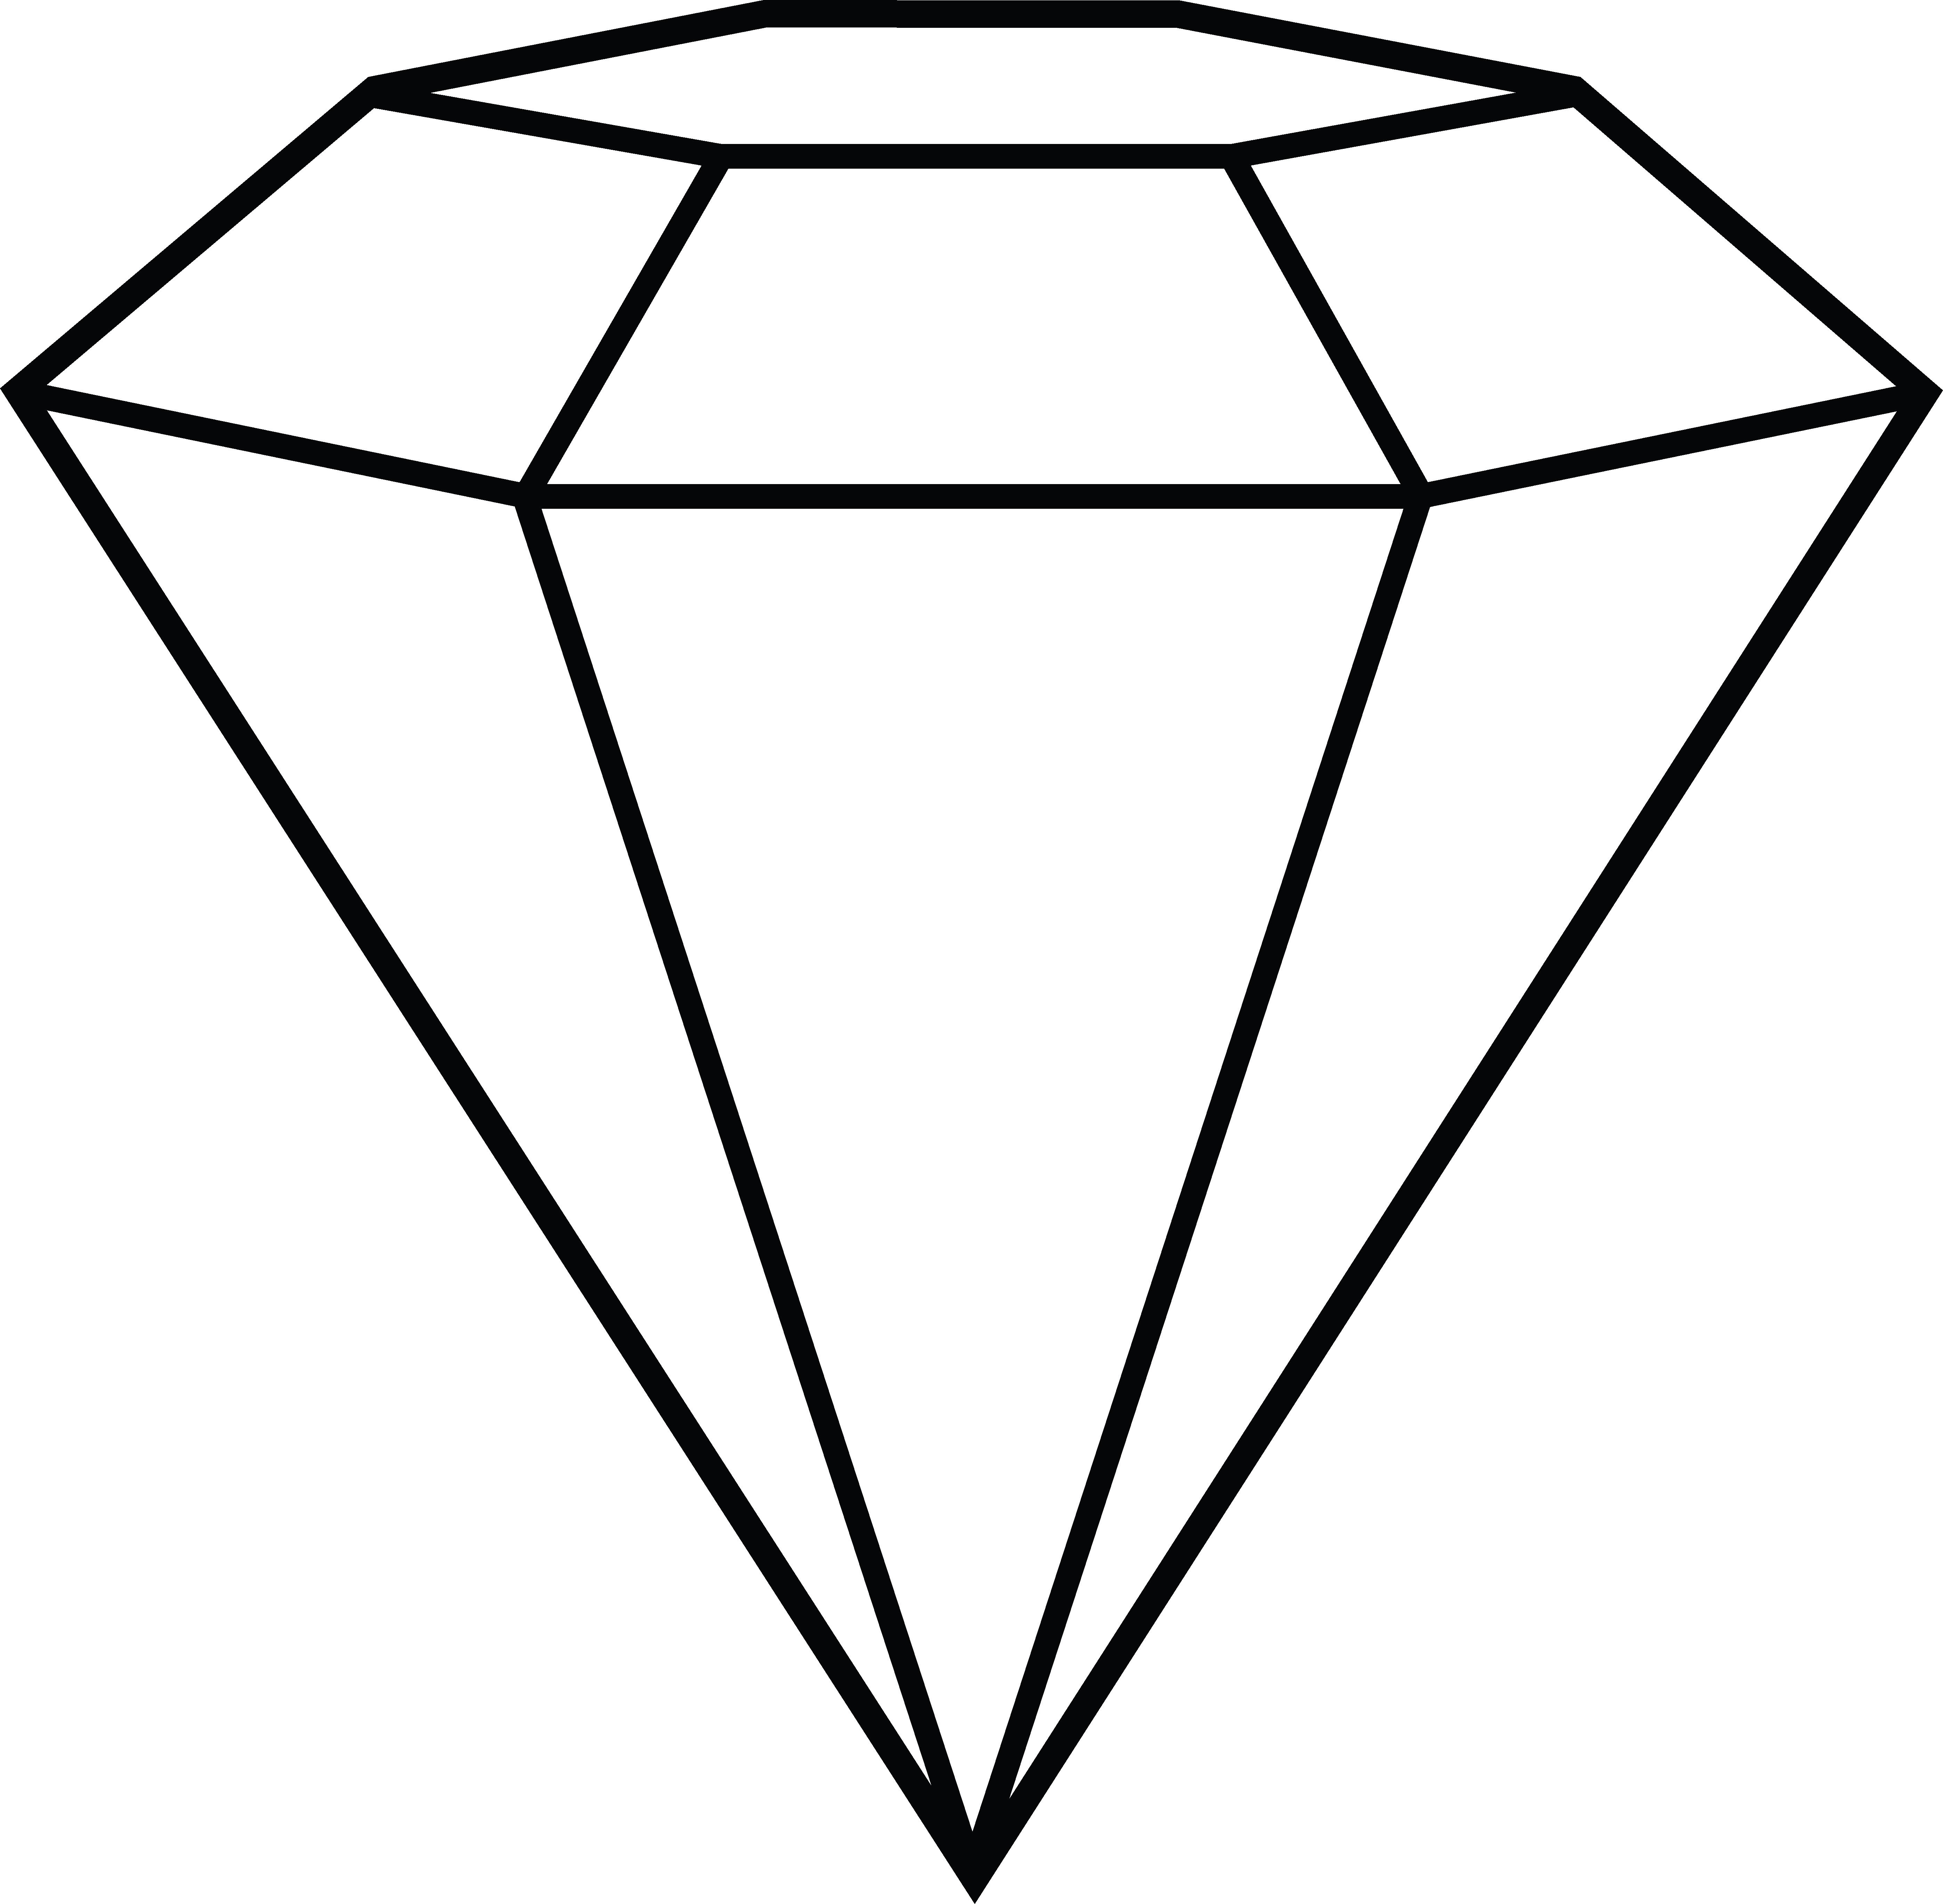 5588x5475 Diamond Coloring Page Beautiful Diamond Line Art Free Clip Art